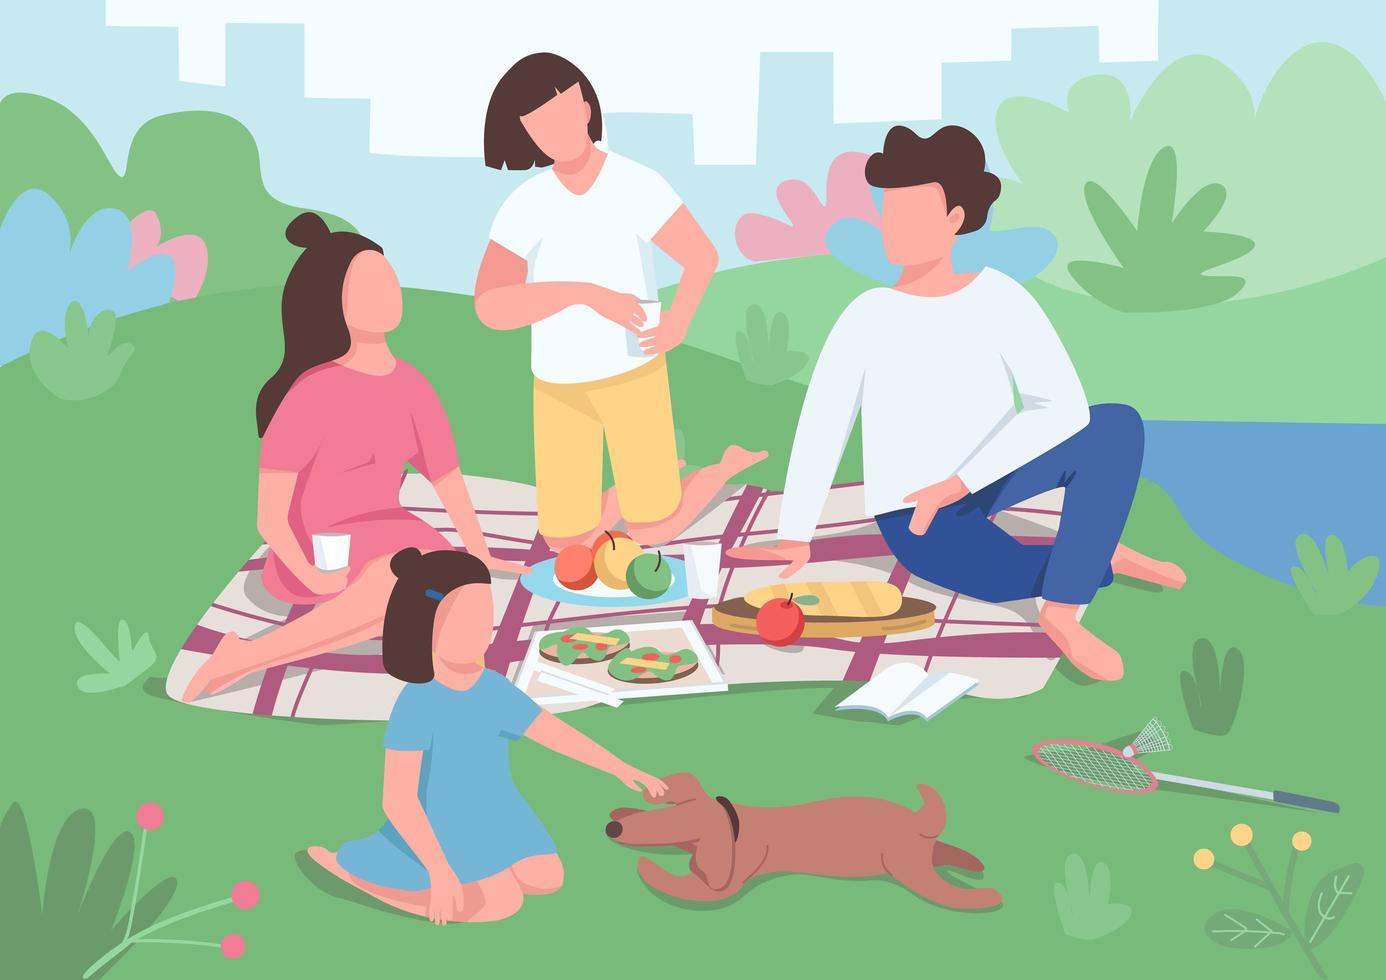 familjens picknick i parken vektor